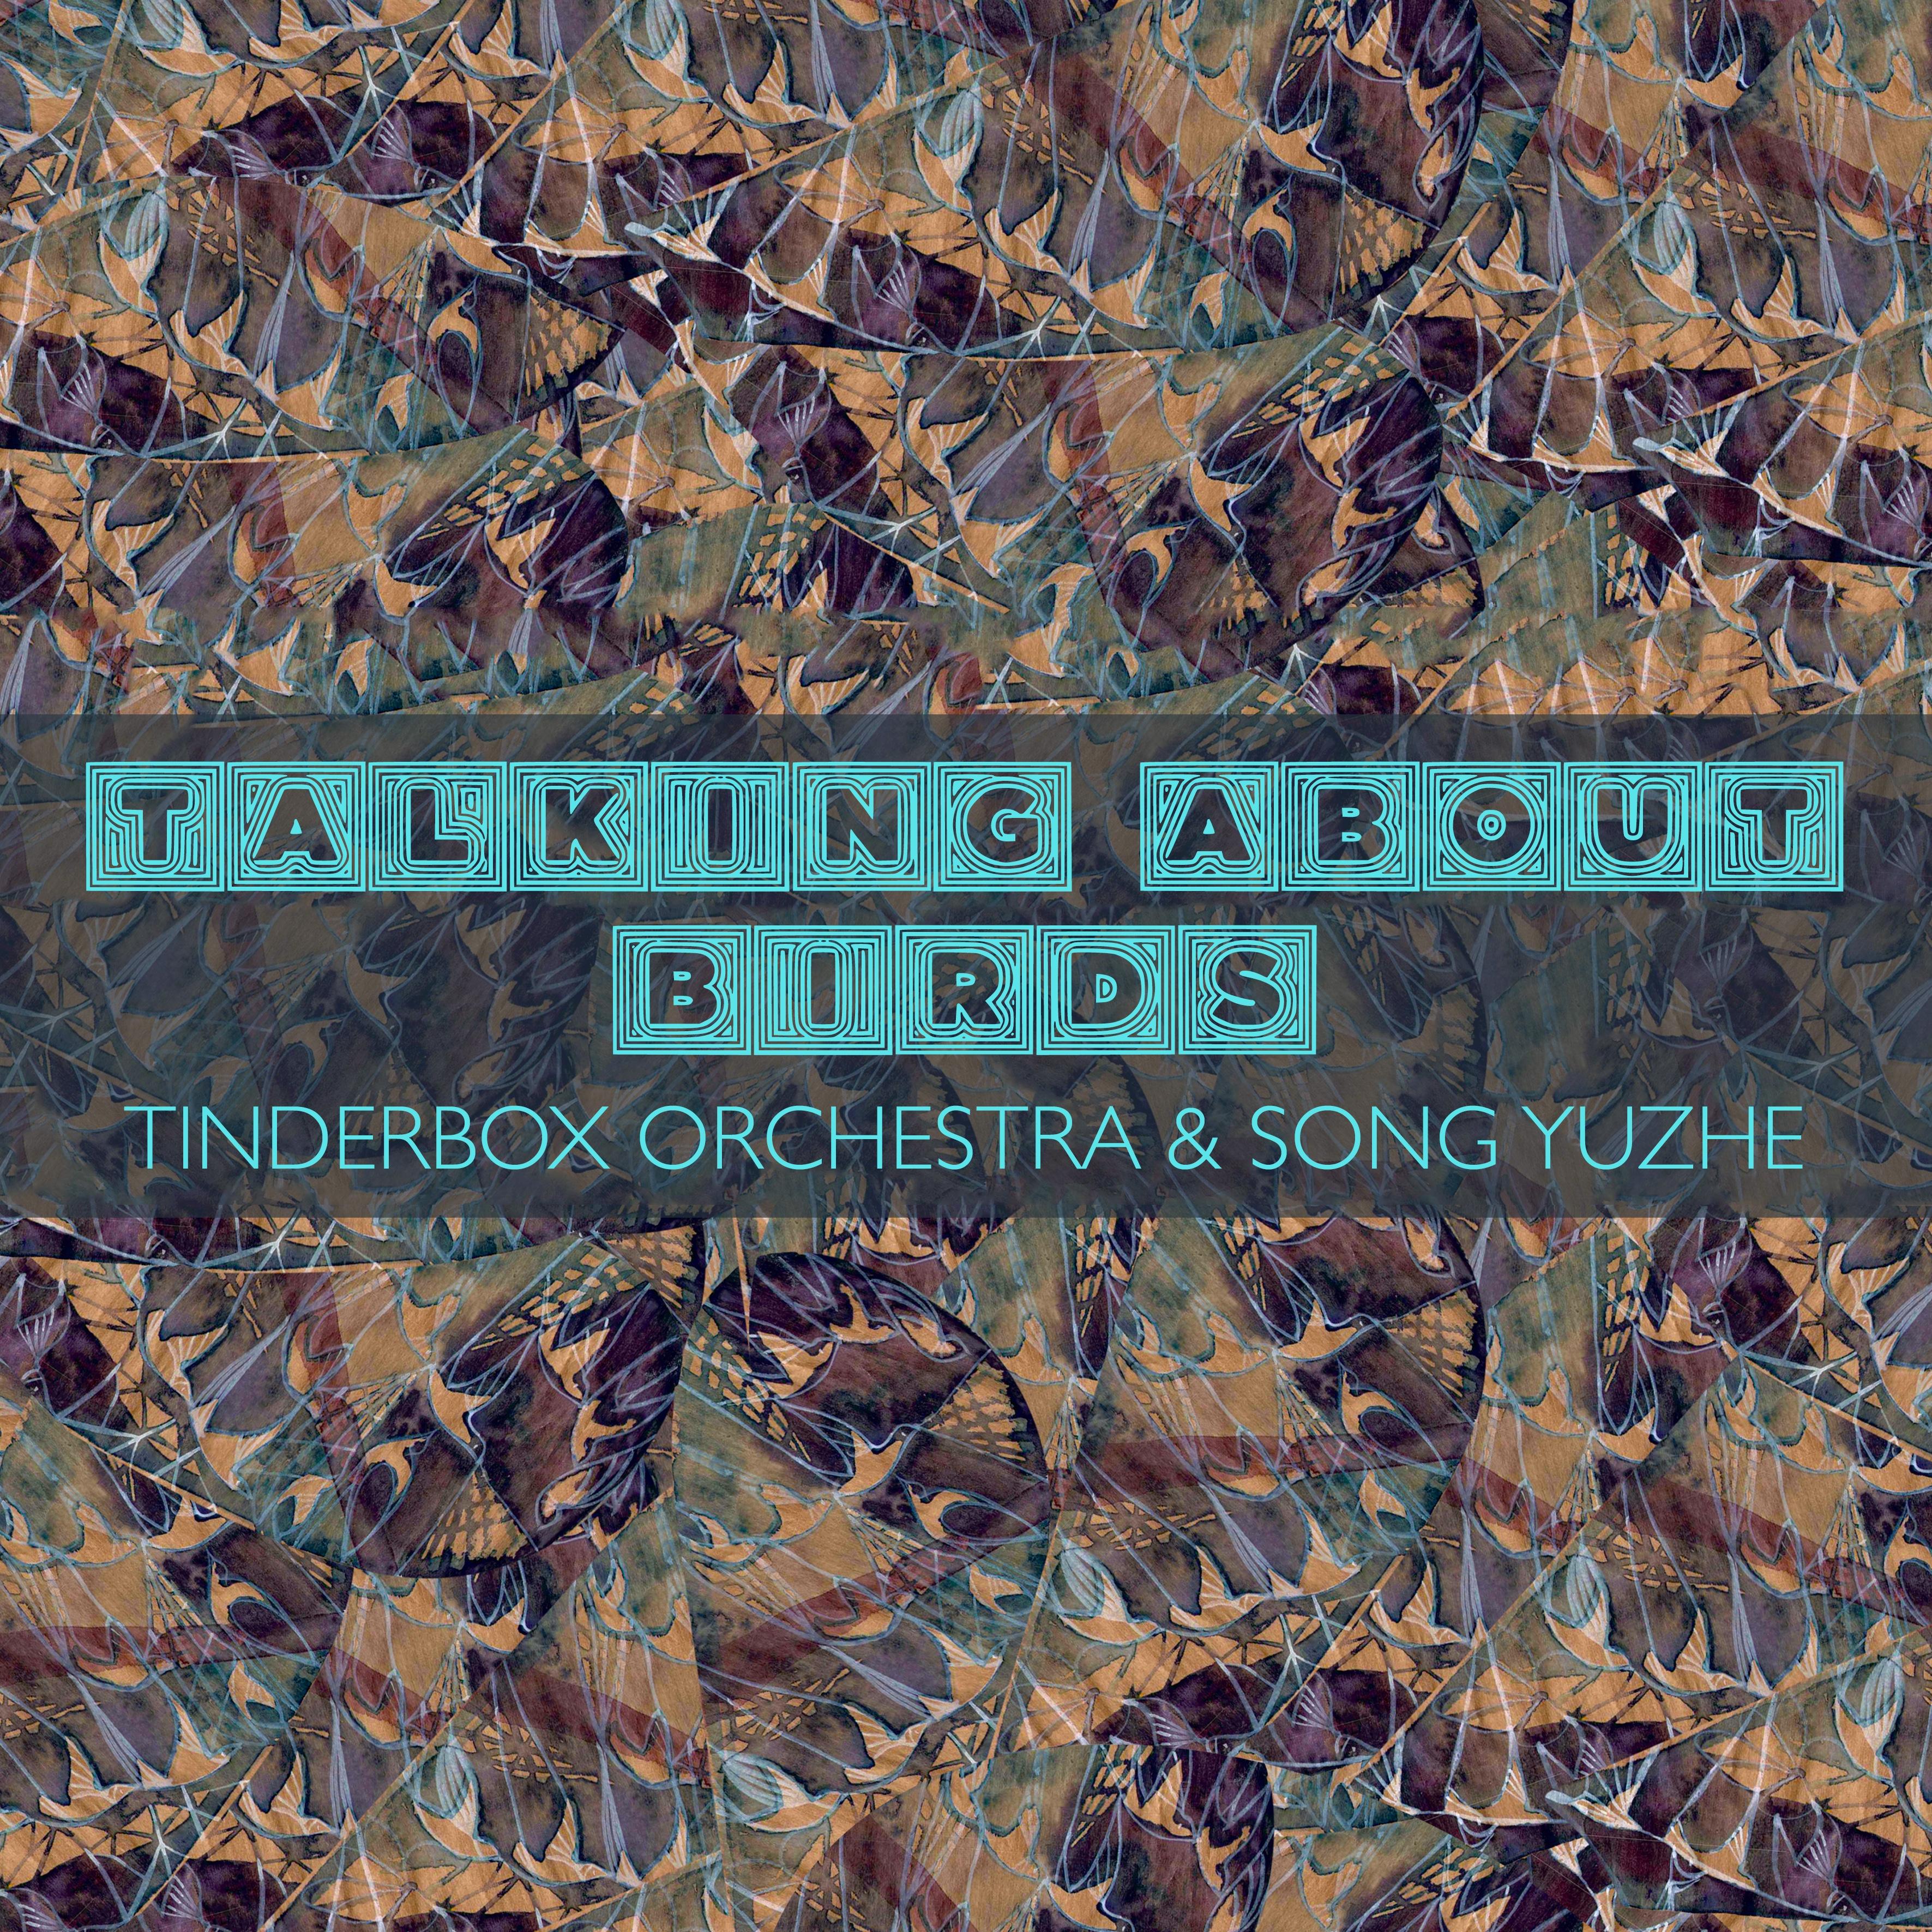 Talking About Birds Artwork